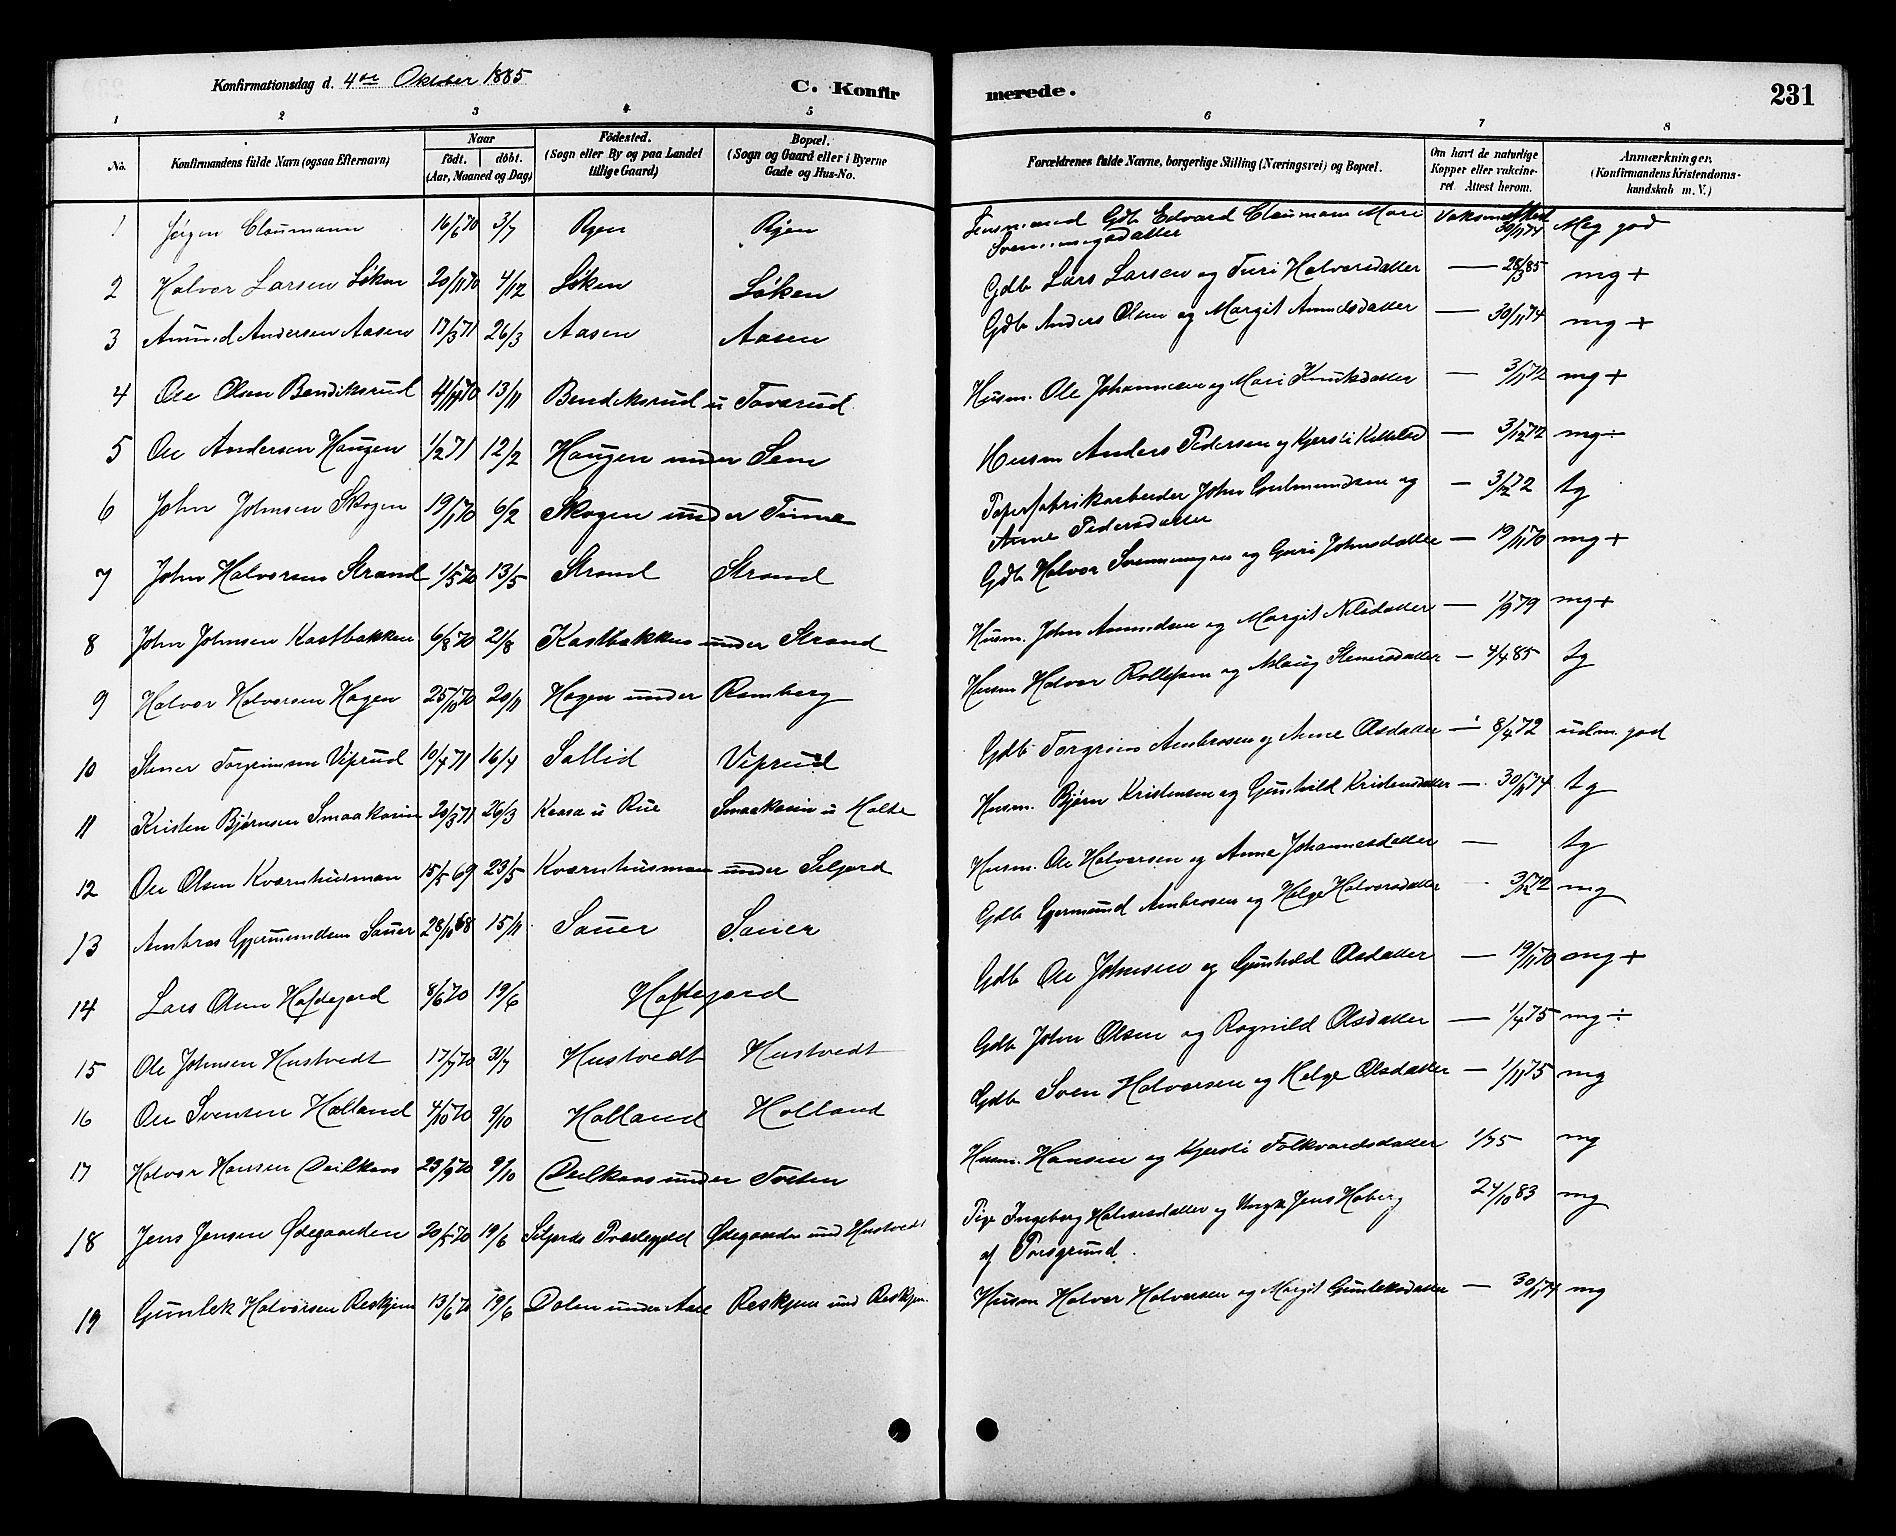 SAKO, Heddal kirkebøker, G/Ga/L0002: Klokkerbok nr. I 2, 1879-1908, s. 231